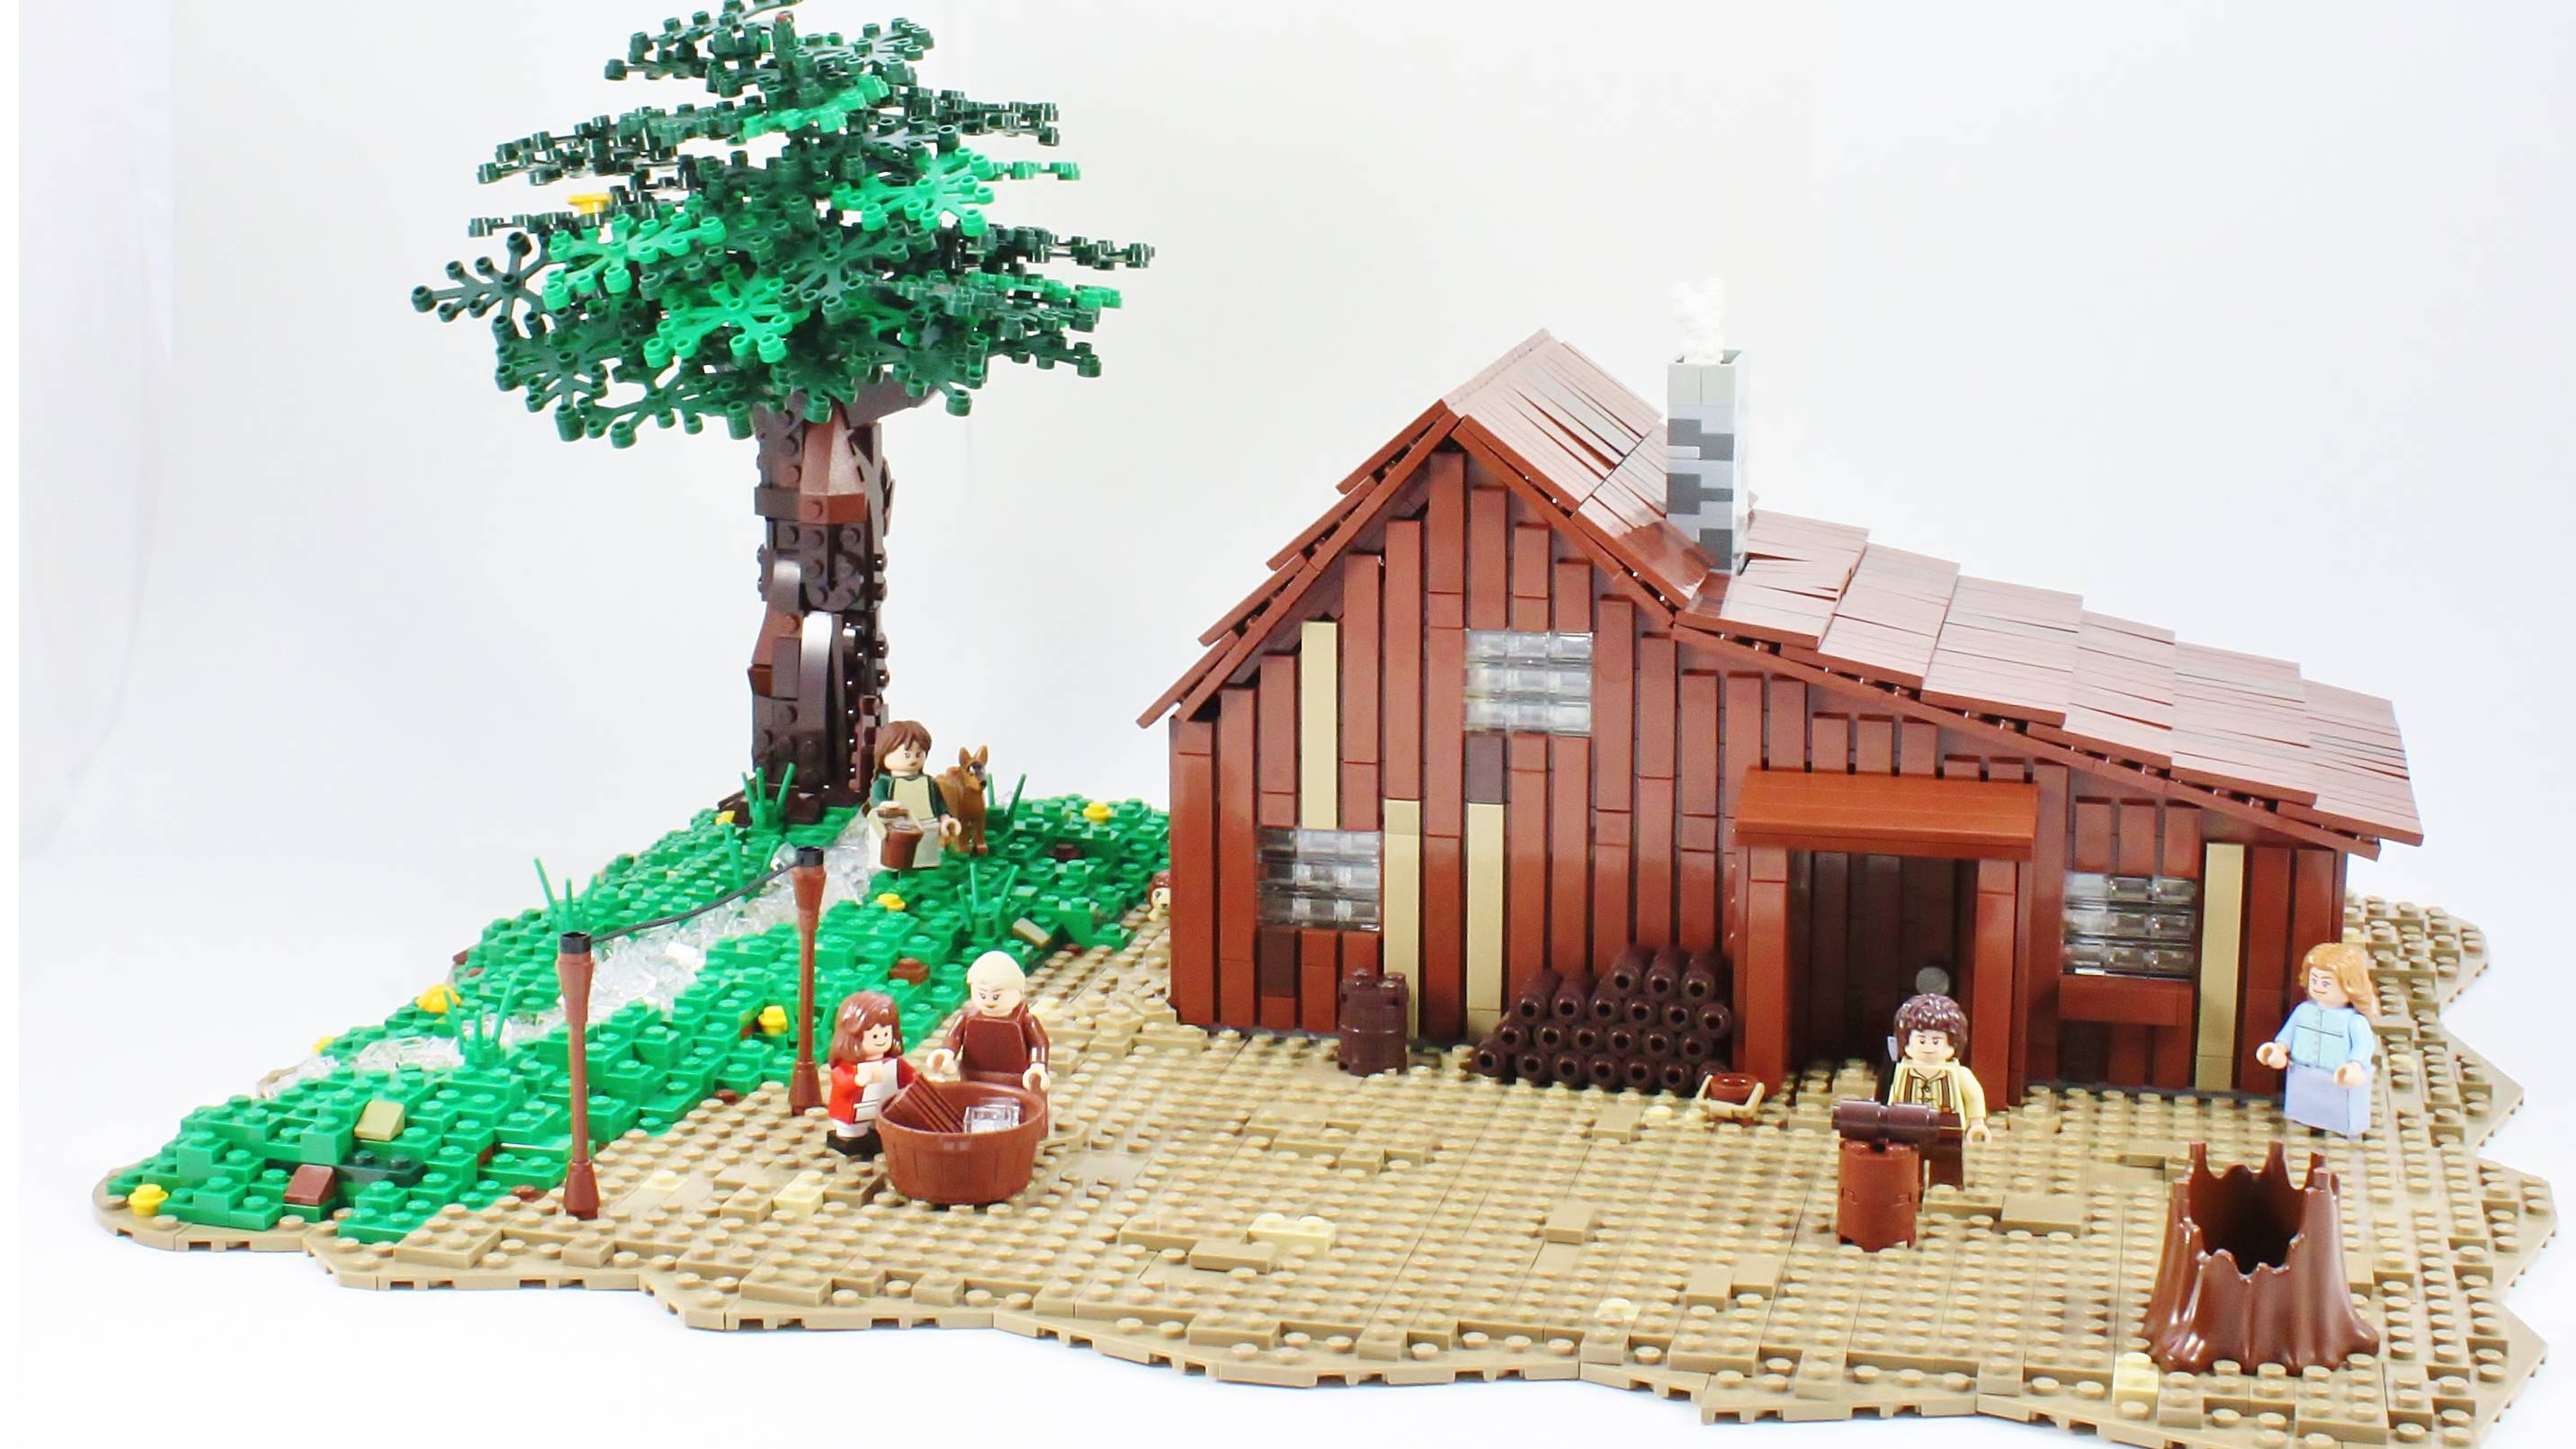 The Little House on the Prairie Lego set prototype.